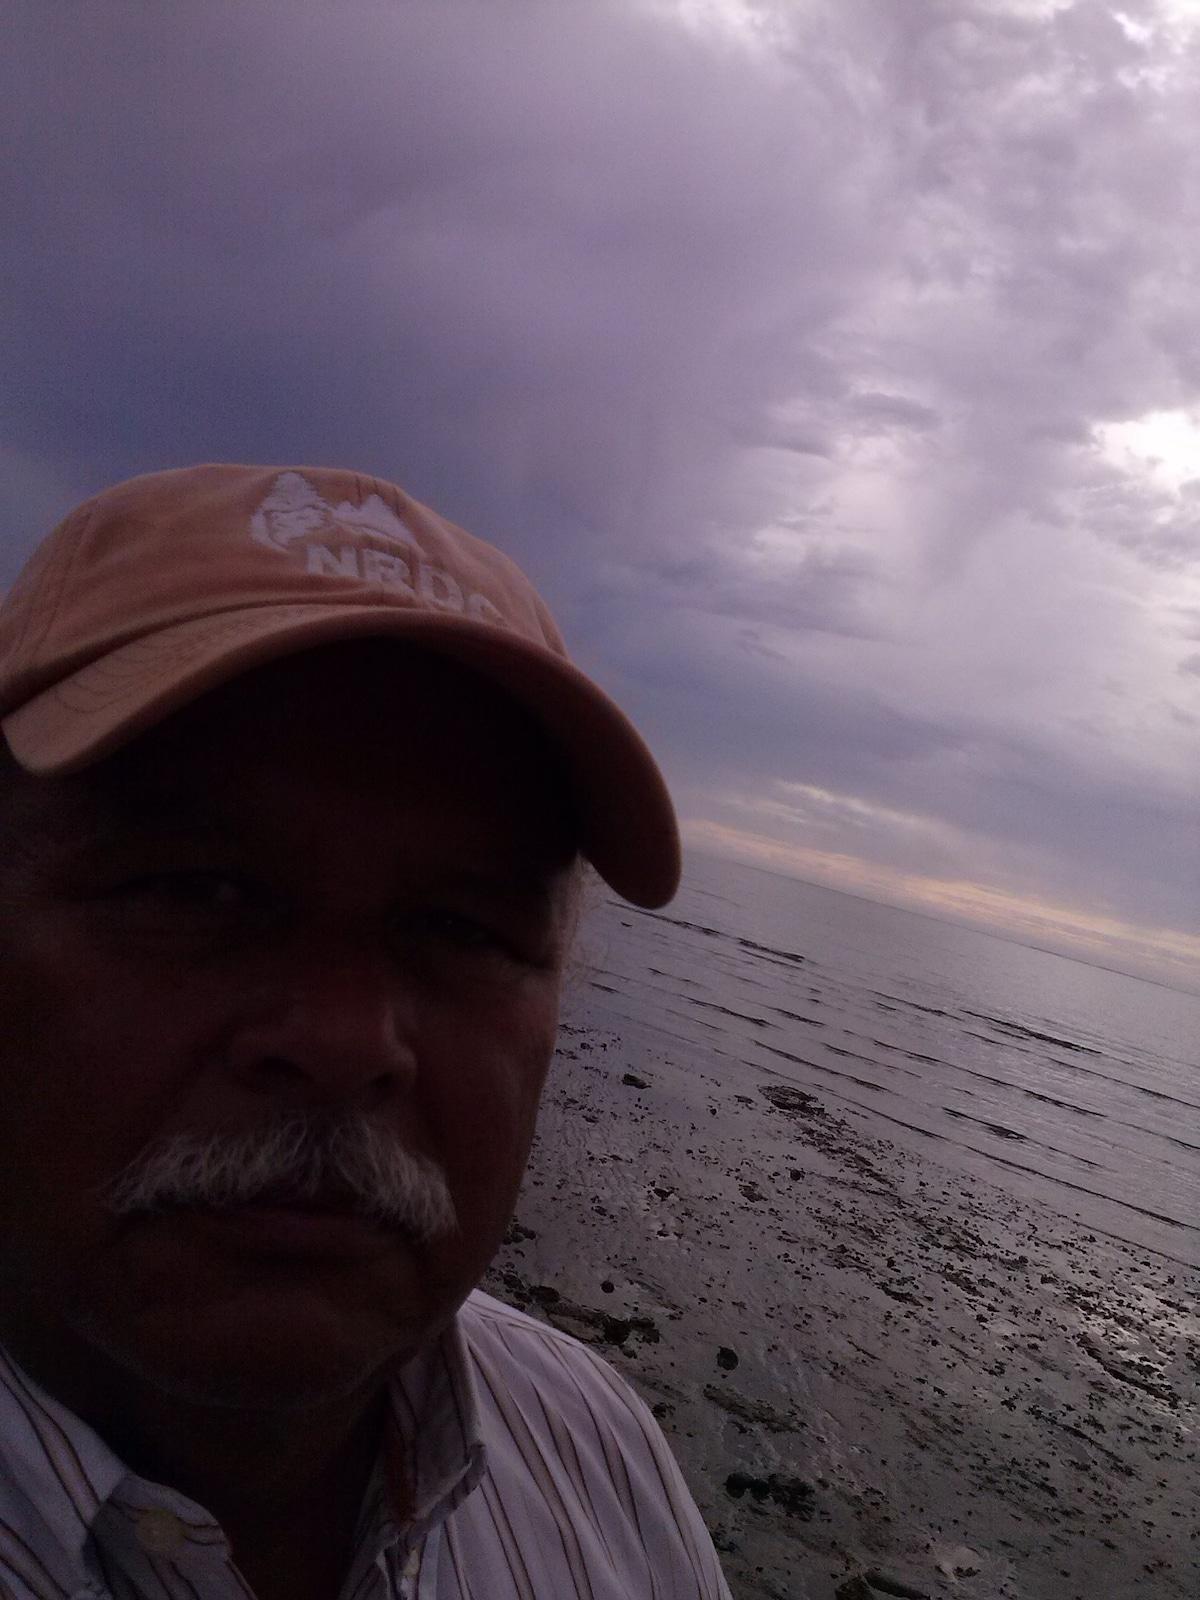 Jorge from Laguna San Ignacio